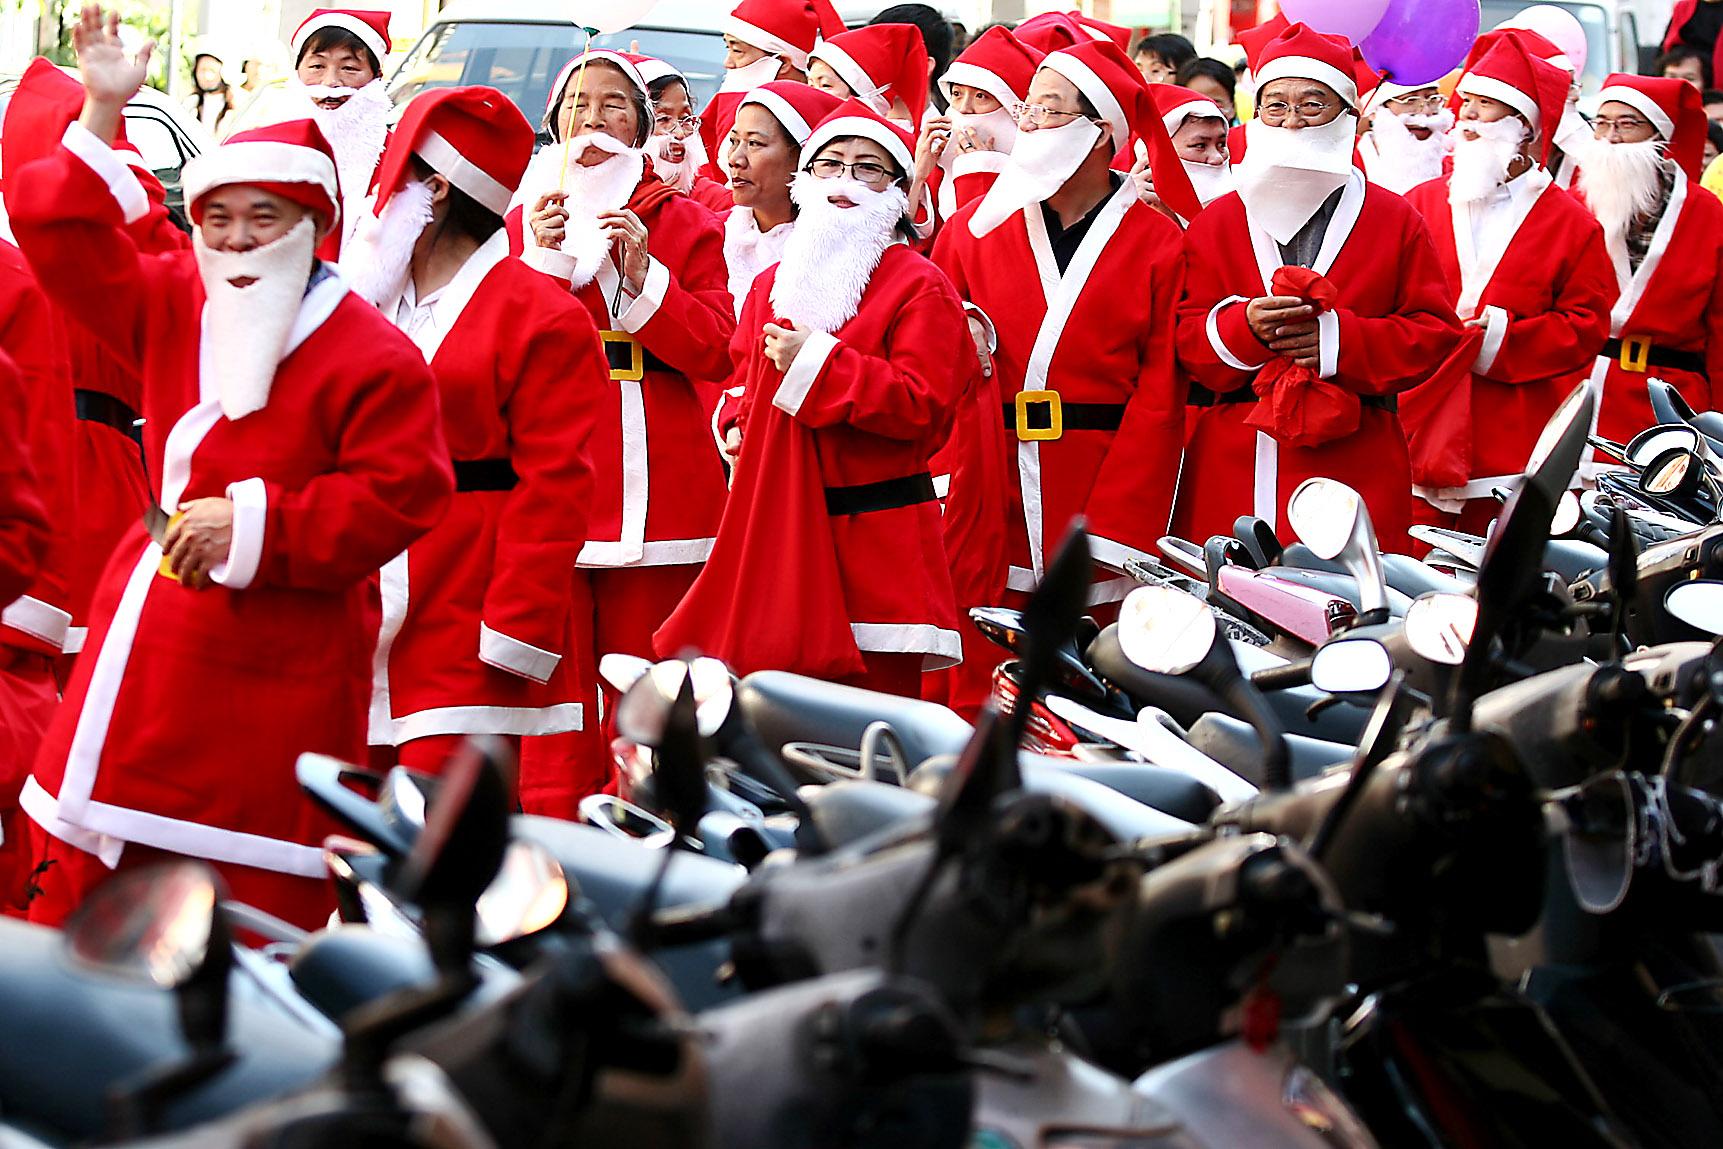 Church members who dress up as Santa Claus walk on a street in Taipei, December 24, 2006.